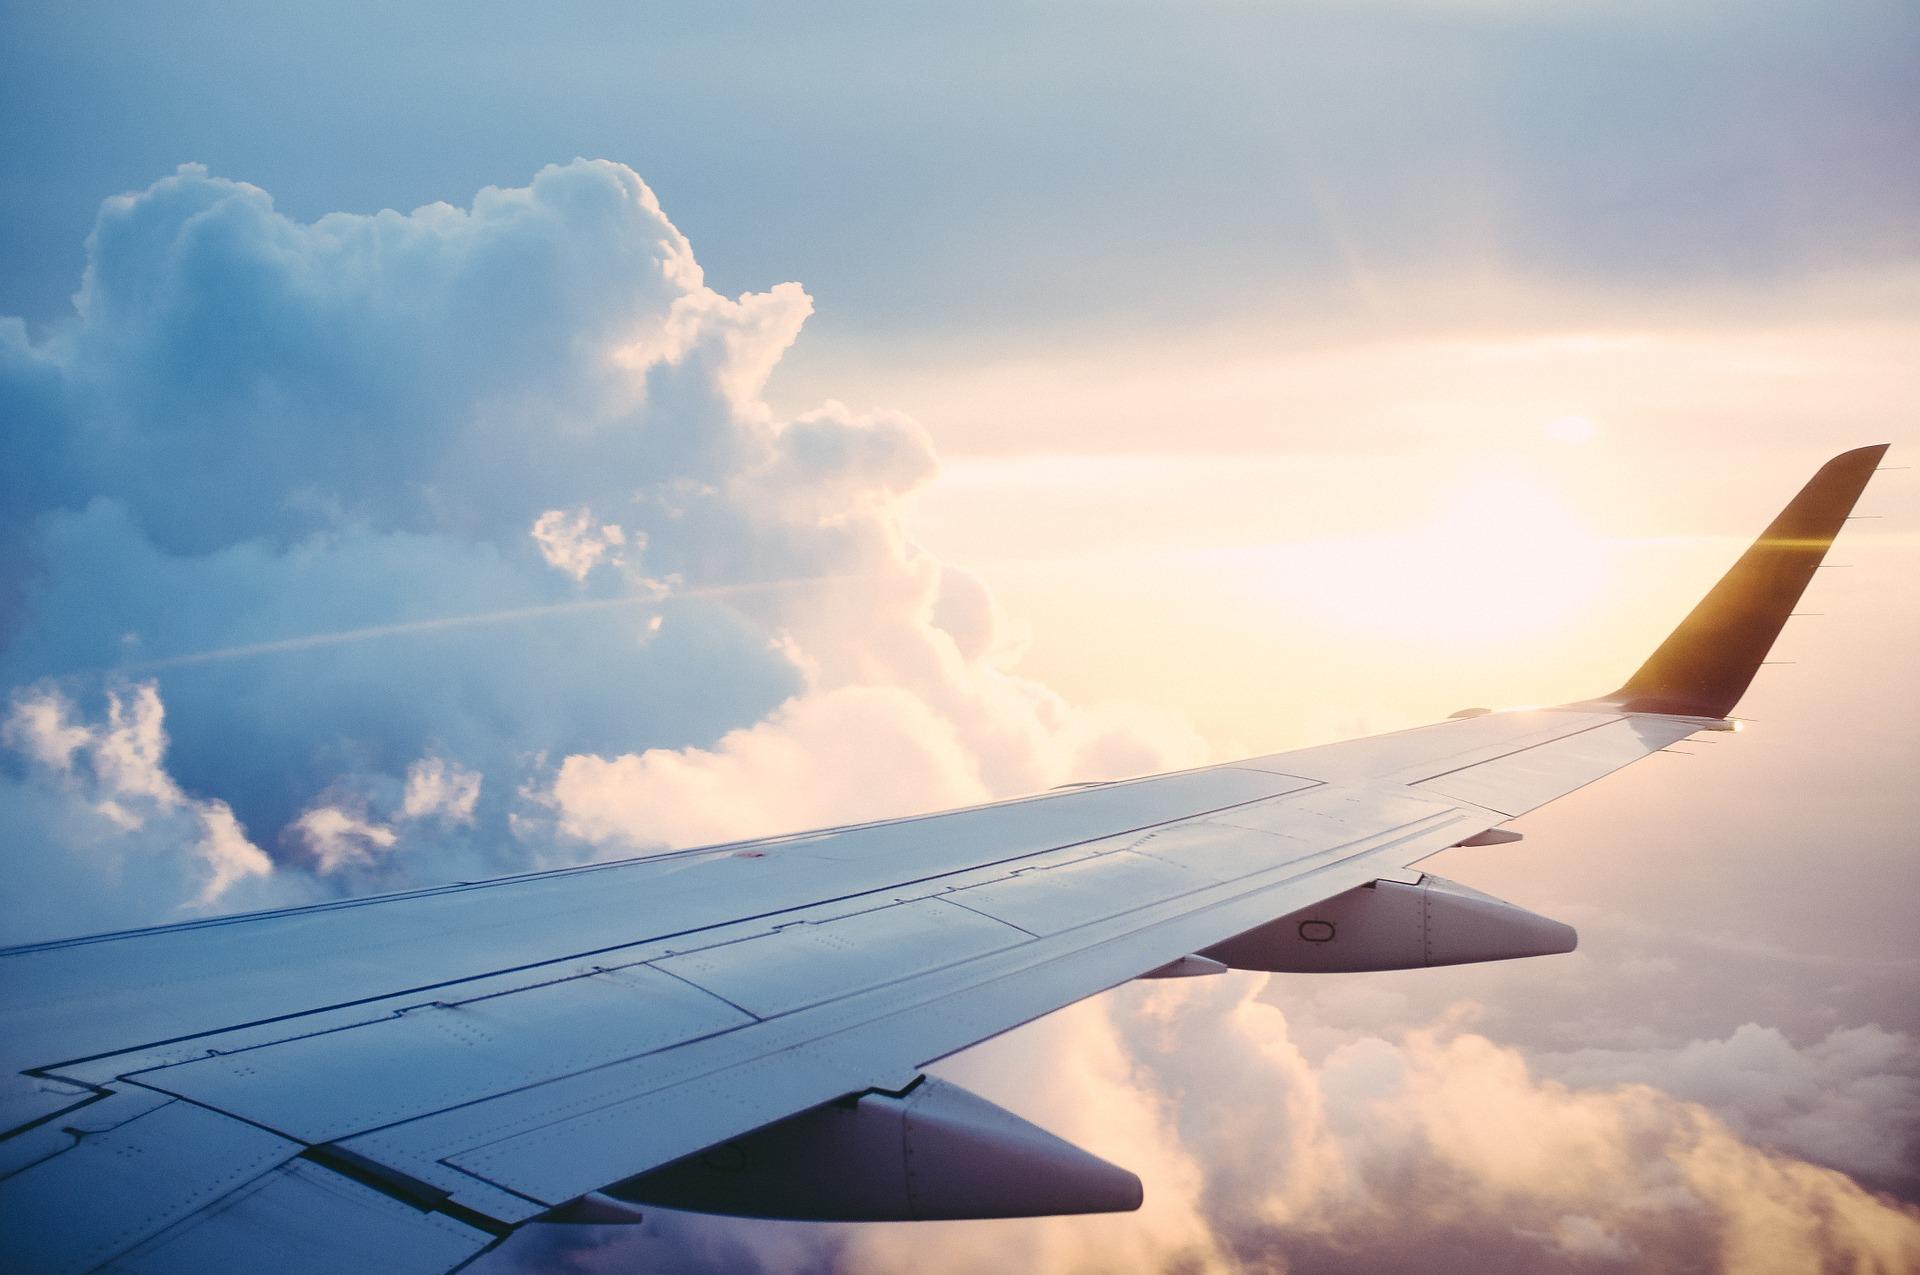 voyage, destinations, soleil, nuage, ciel, vols, vacances, avion